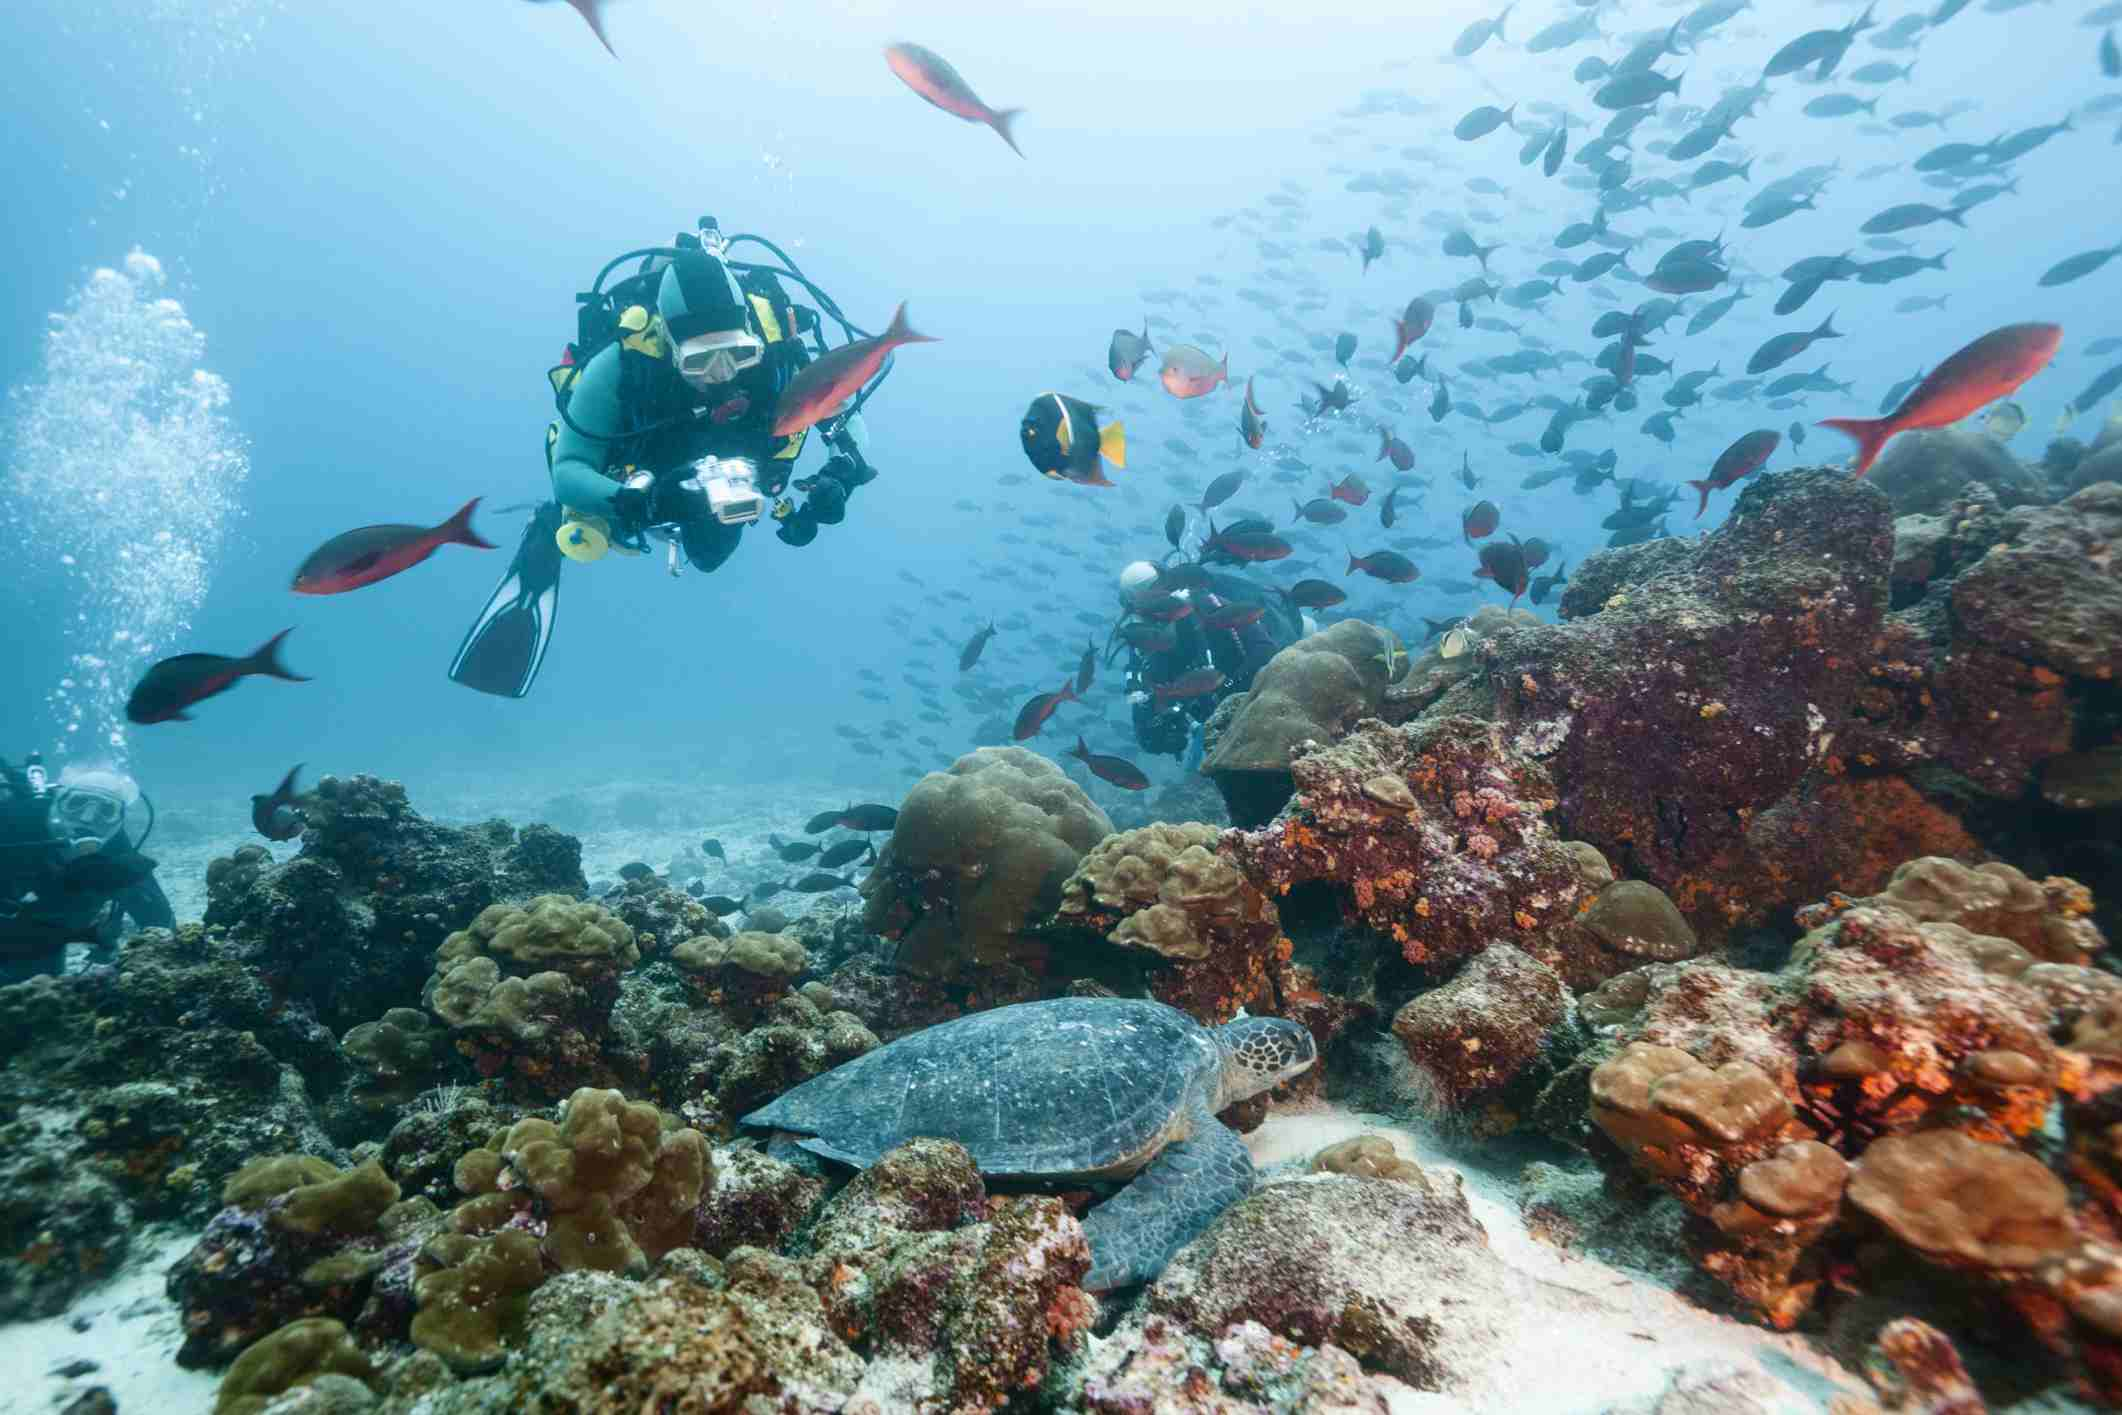 Scuba diving off the Galapagos Islands